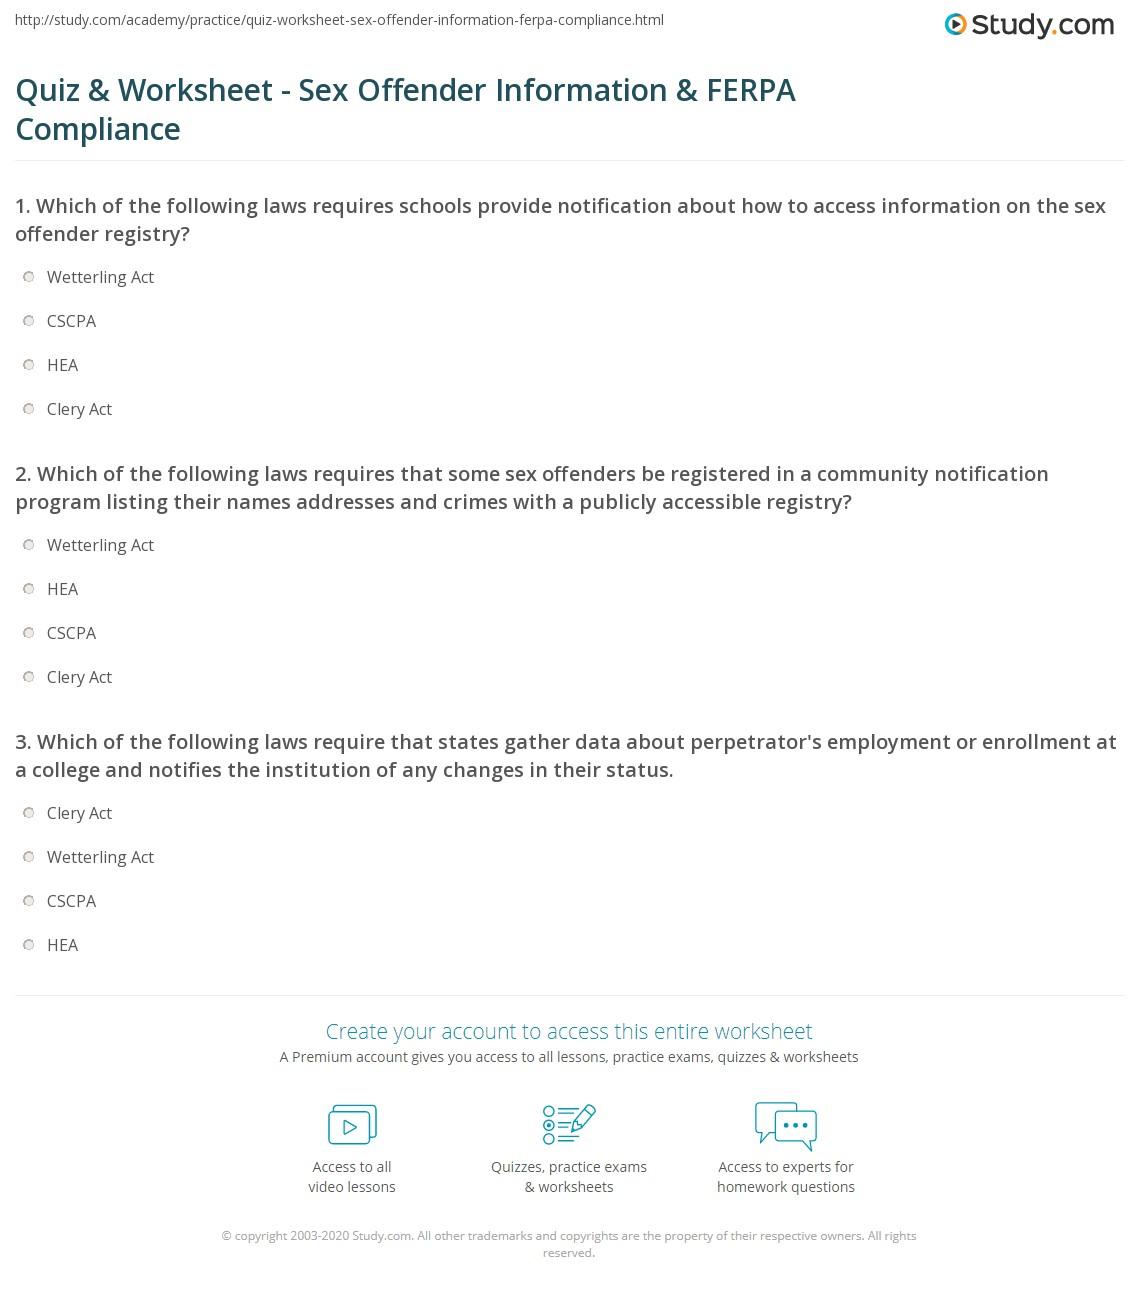 Quiz Worksheet Sex Offender Information Ferpa Compliance